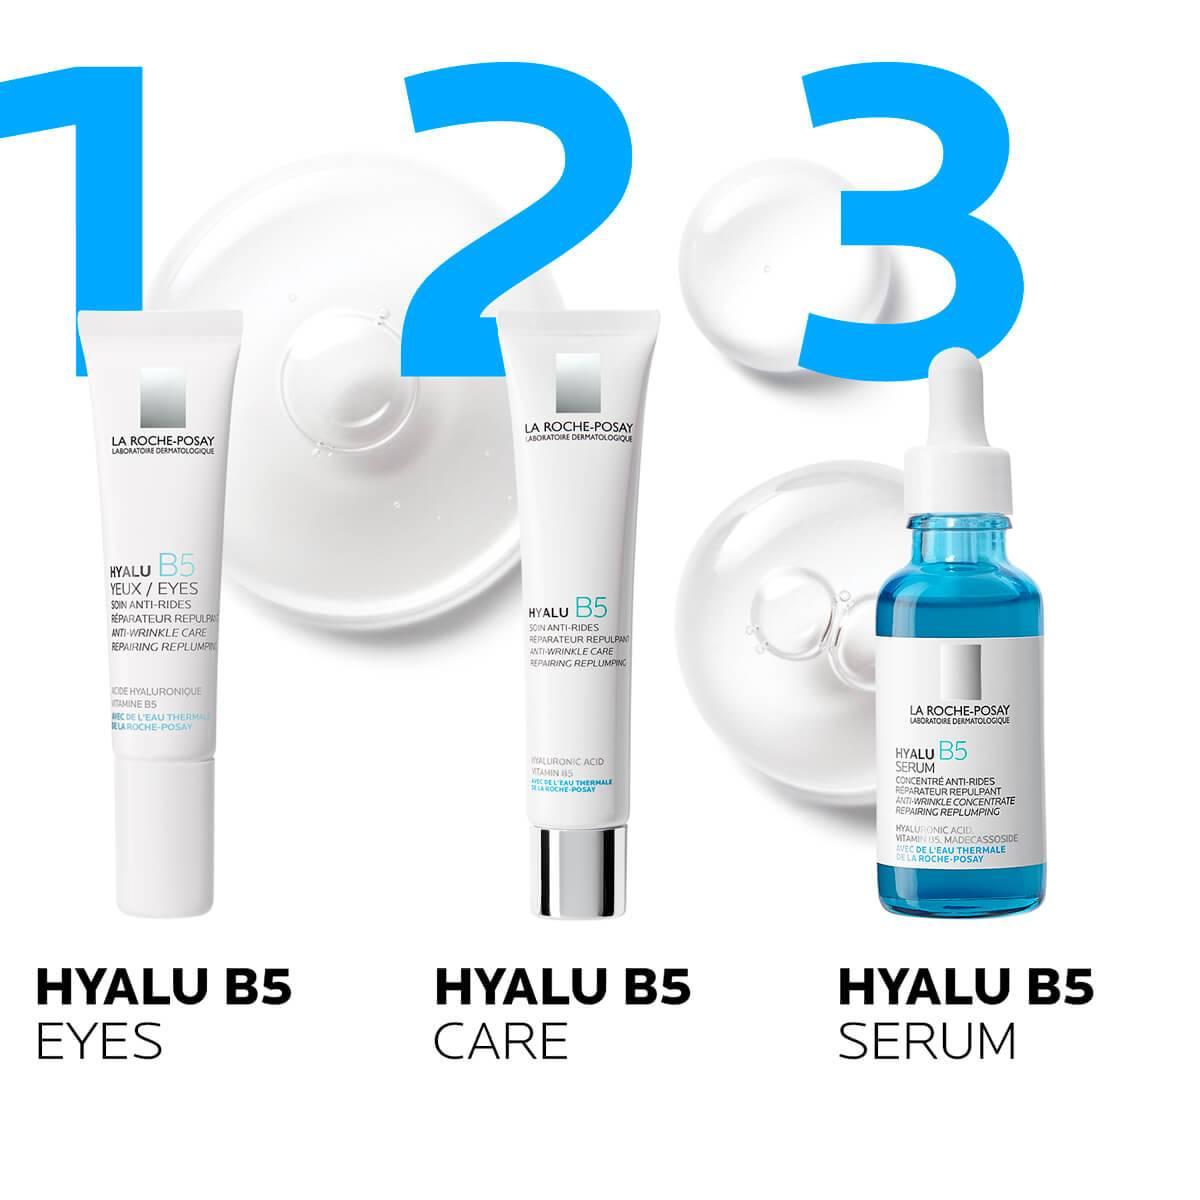 La Roche Posay ProduktSide Anti Aging Hyalu B5 Serum 30ml 333787558362 rutine